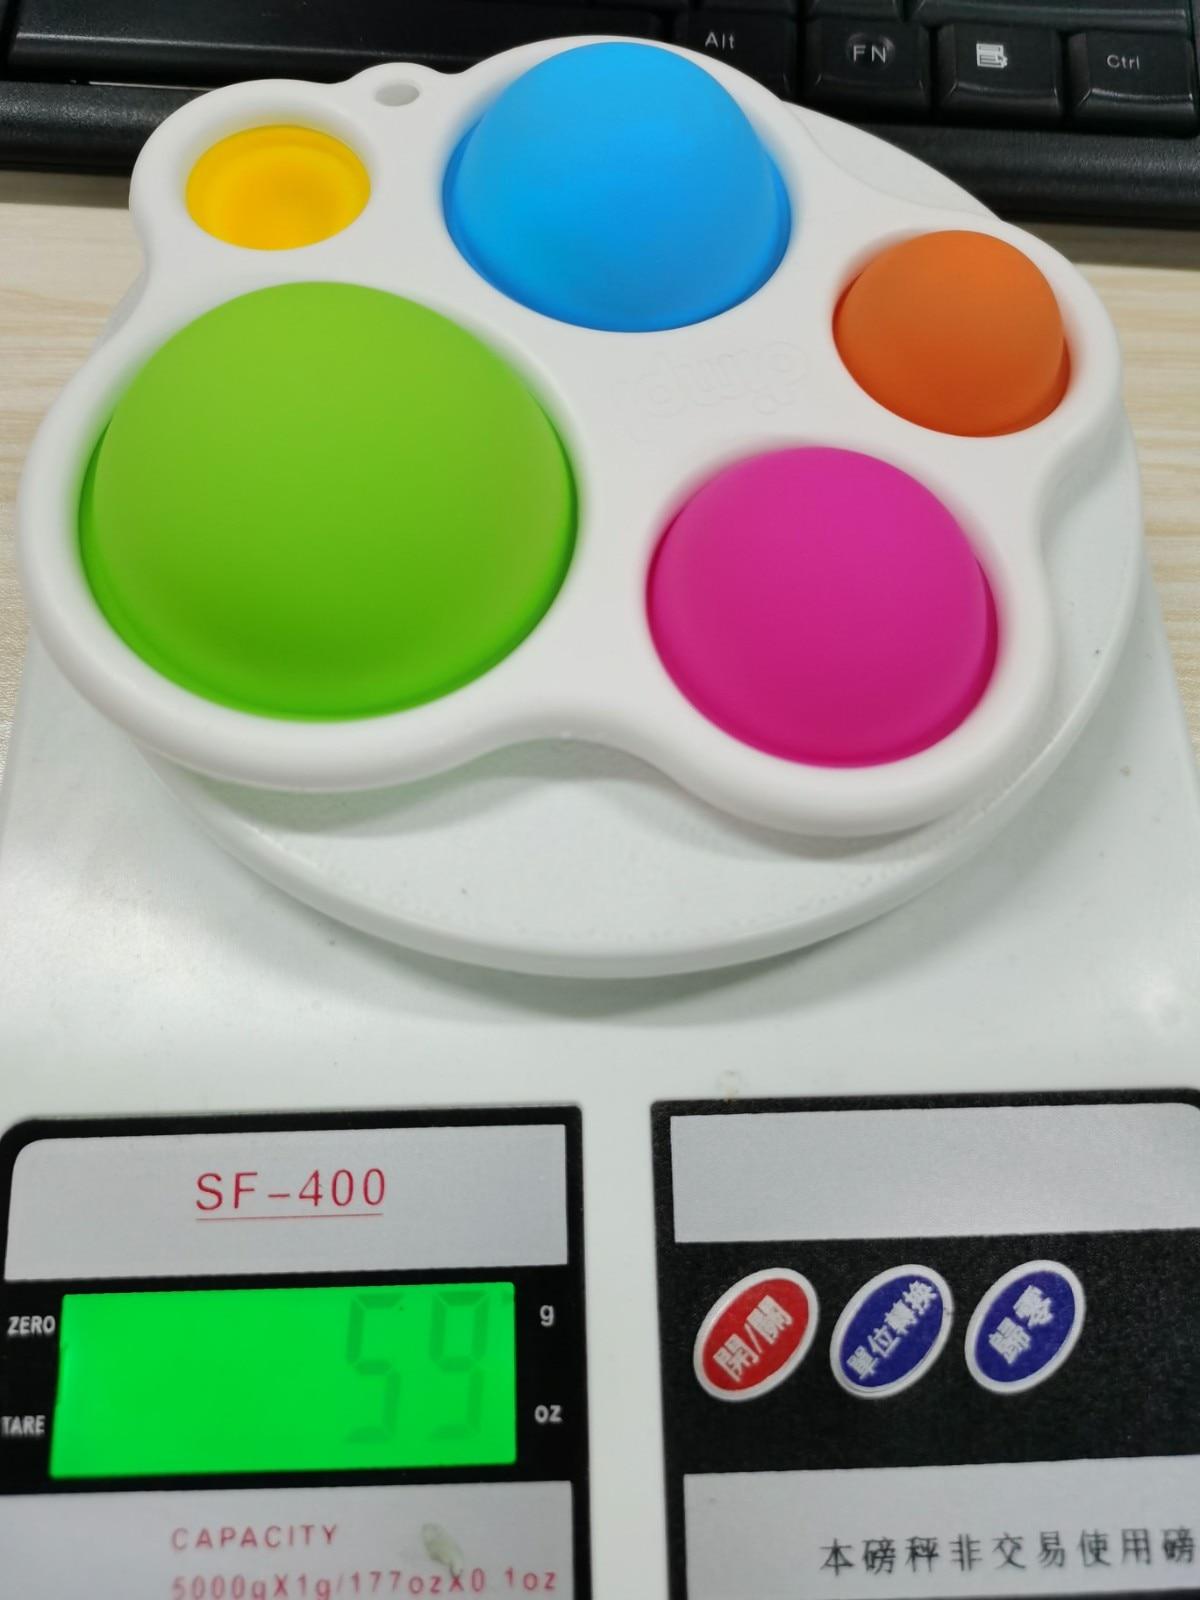 Training-Toys Fidget-Sensory-Toys Intelligence-Development ADULTES Reliver Decompression img4